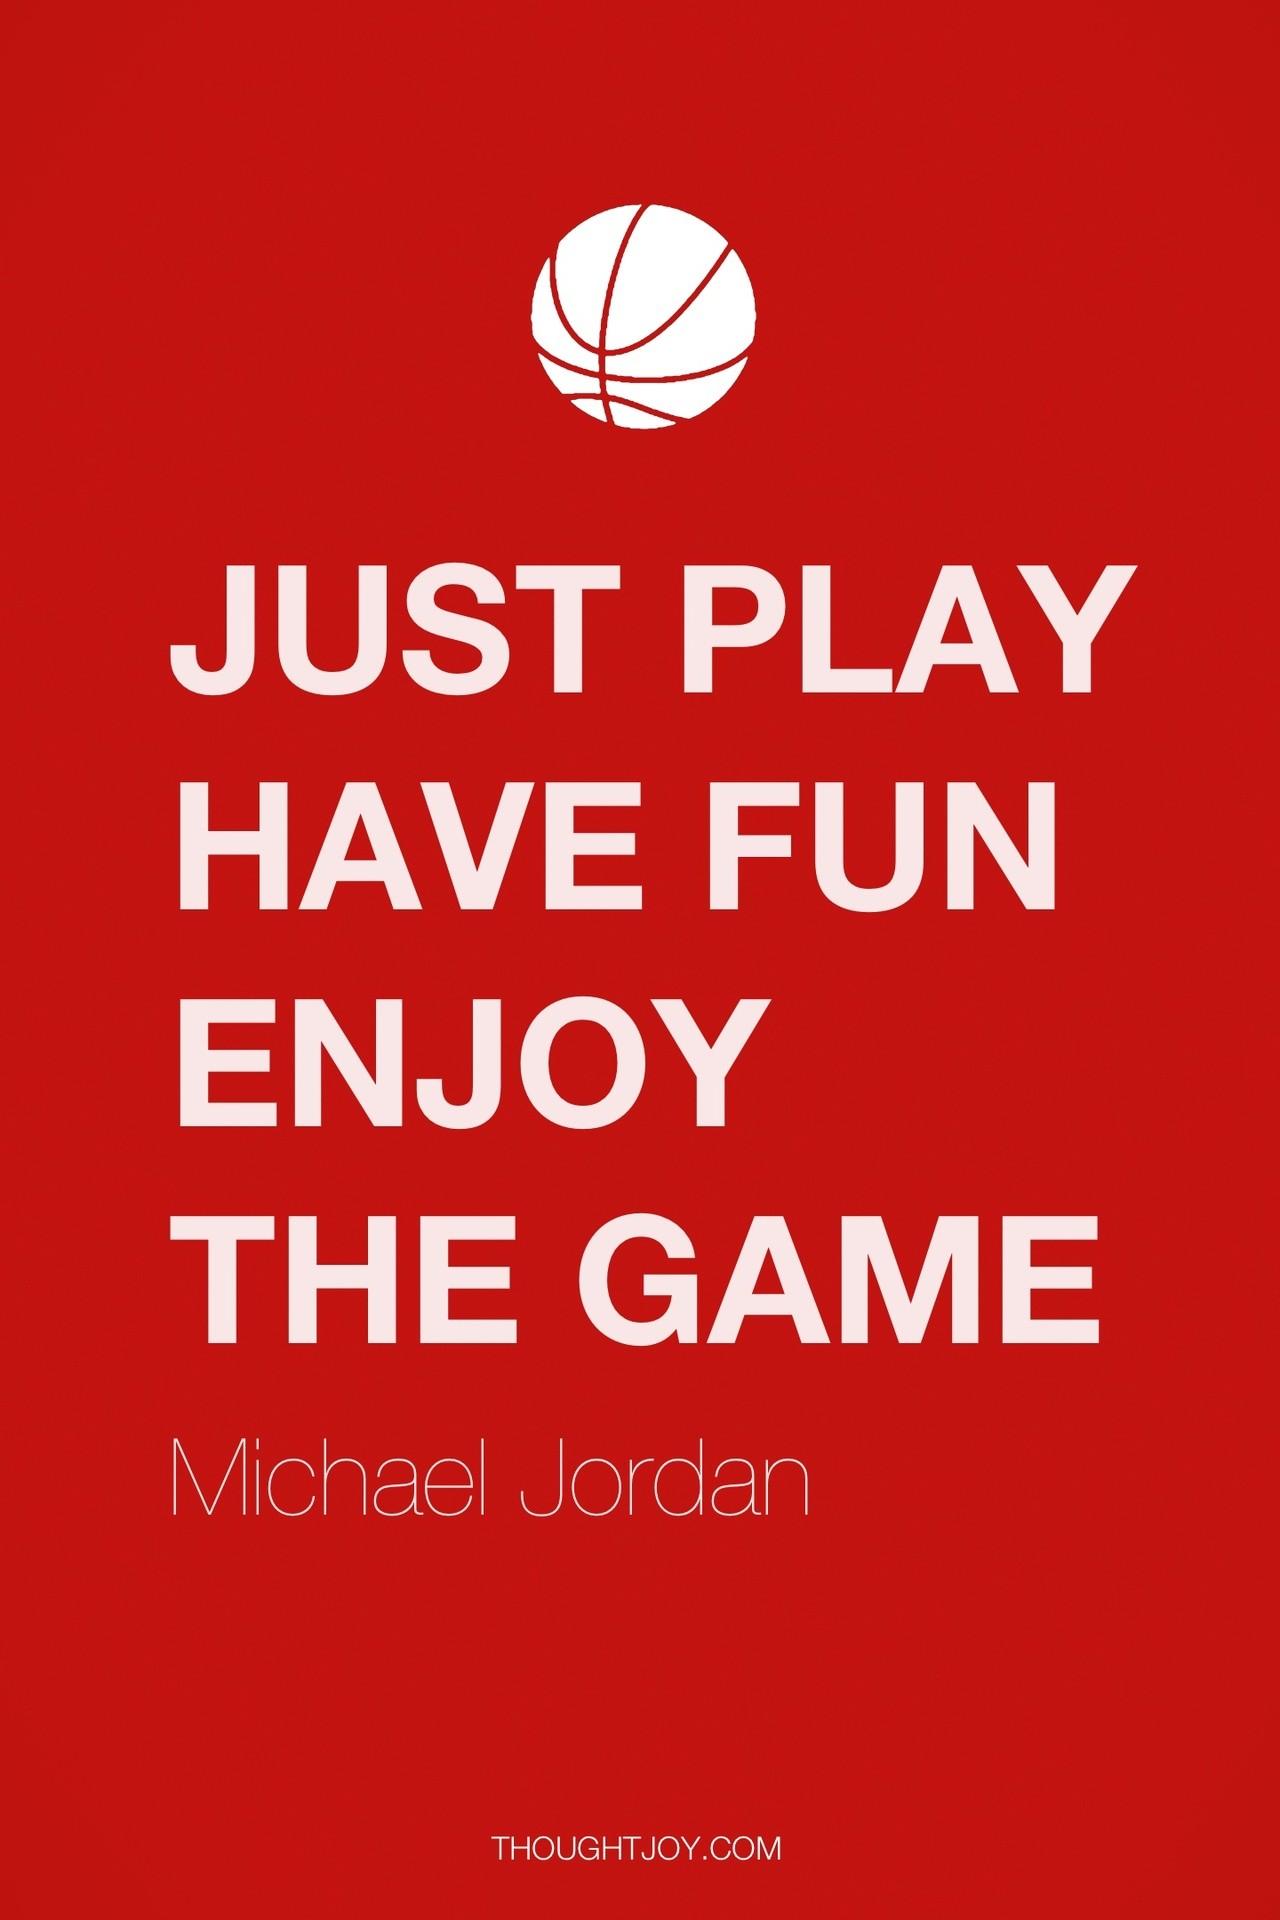 Jordan couples quotes